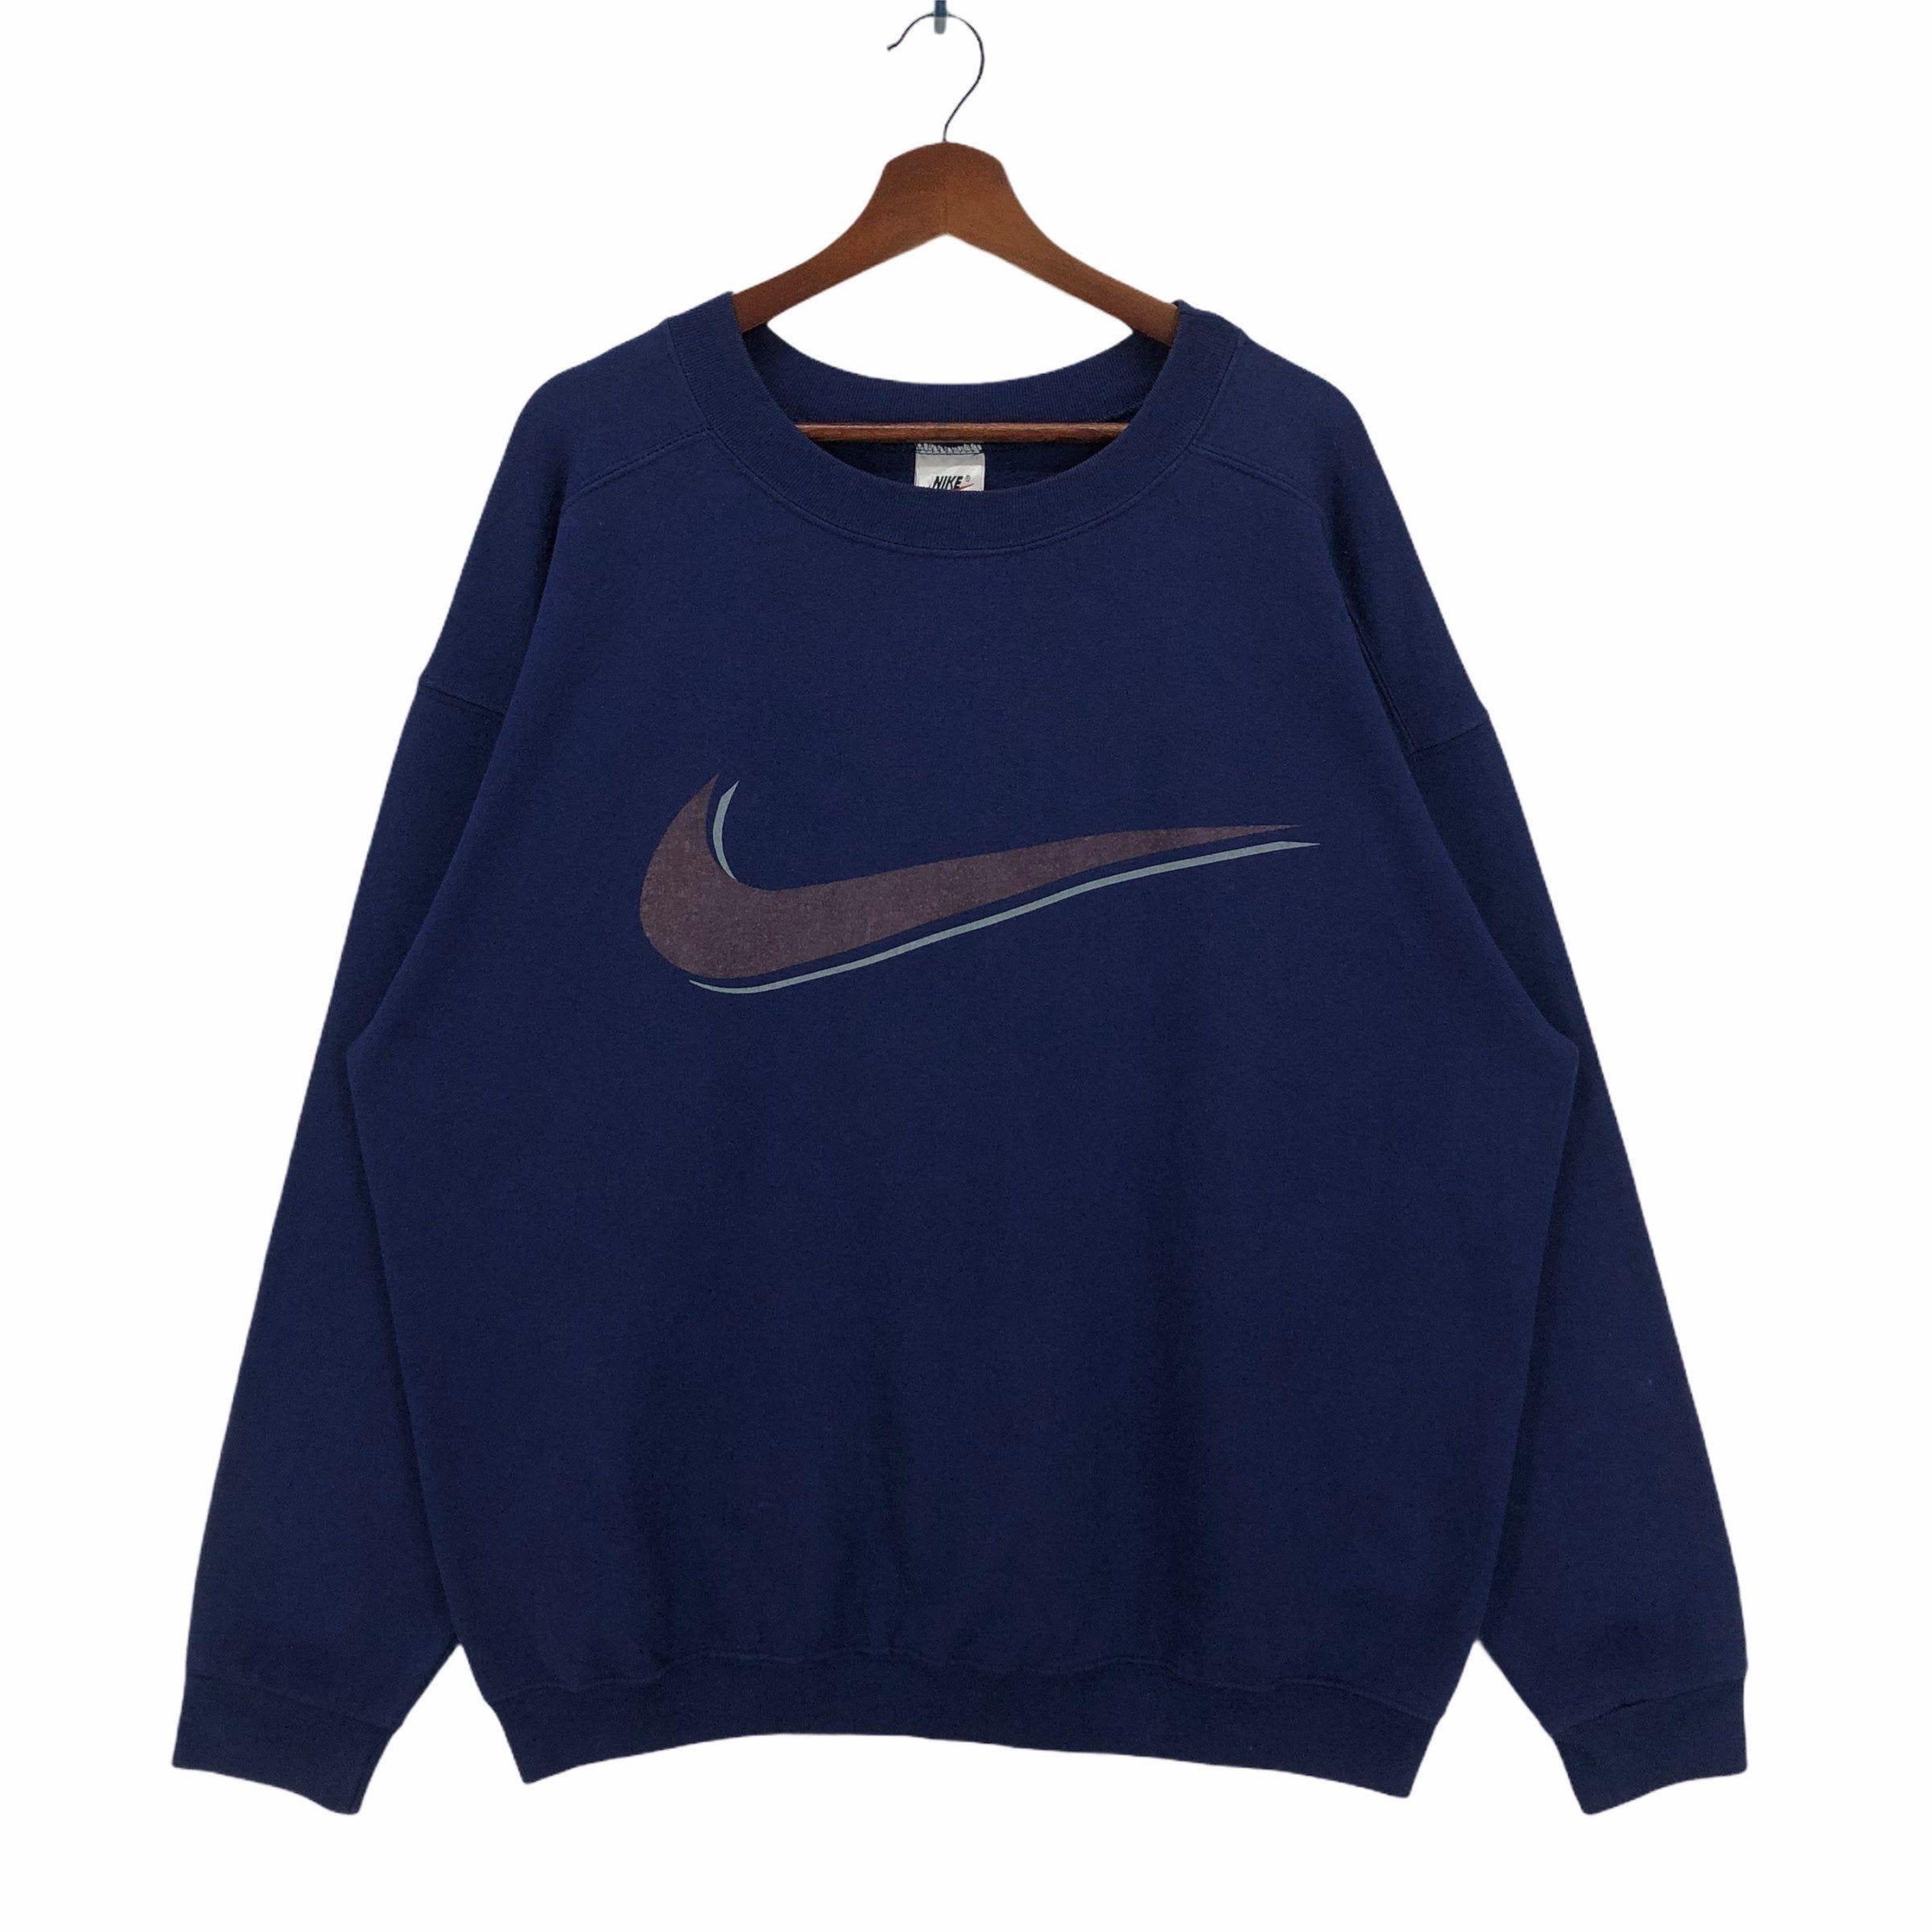 Vintage Navy Nike Sweatshirt Crewneck Nike Swoosh Big Logo Etsy In 2021 Vintage Sweatshirt Vintage Nike Sweatshirt Sweatshirts [ 2400 x 2400 Pixel ]